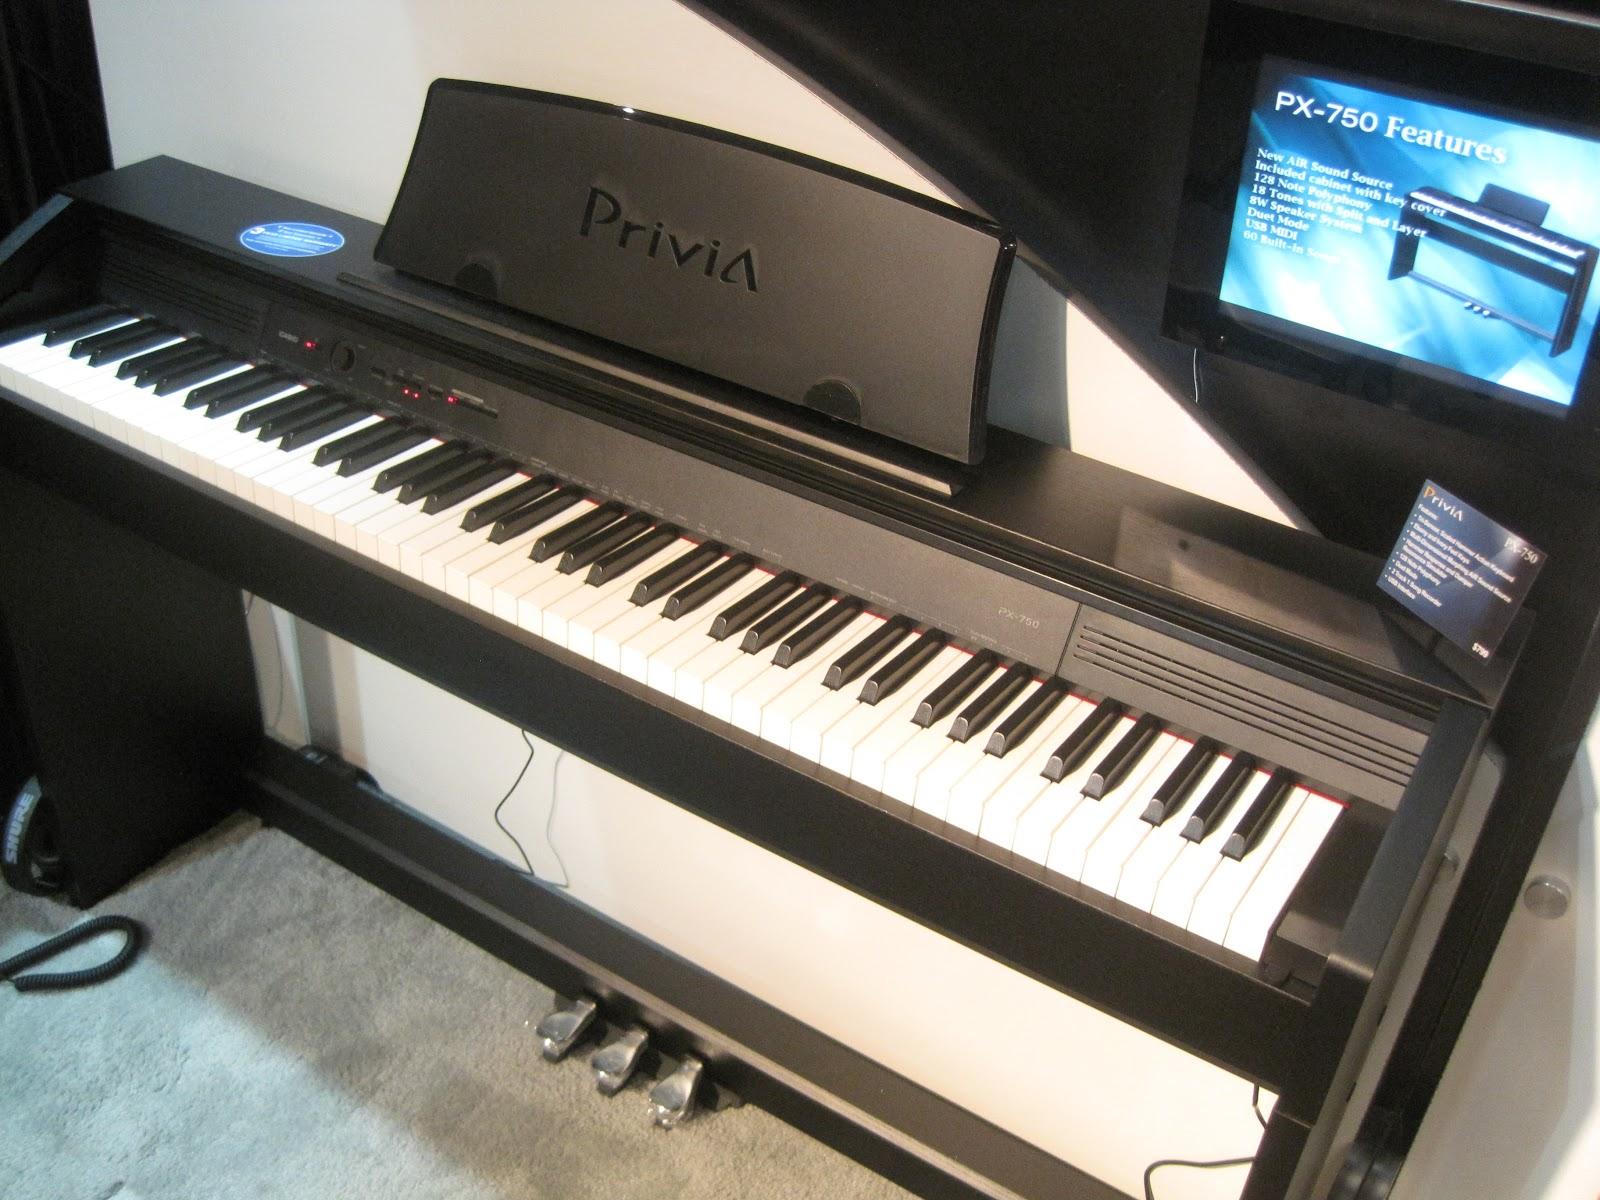 Digital Piano Casio Vs Yamaha : az piano reviews review yamaha p35 casio cdp120 casio cdp130 digital pianos under 500 ~ Russianpoet.info Haus und Dekorationen